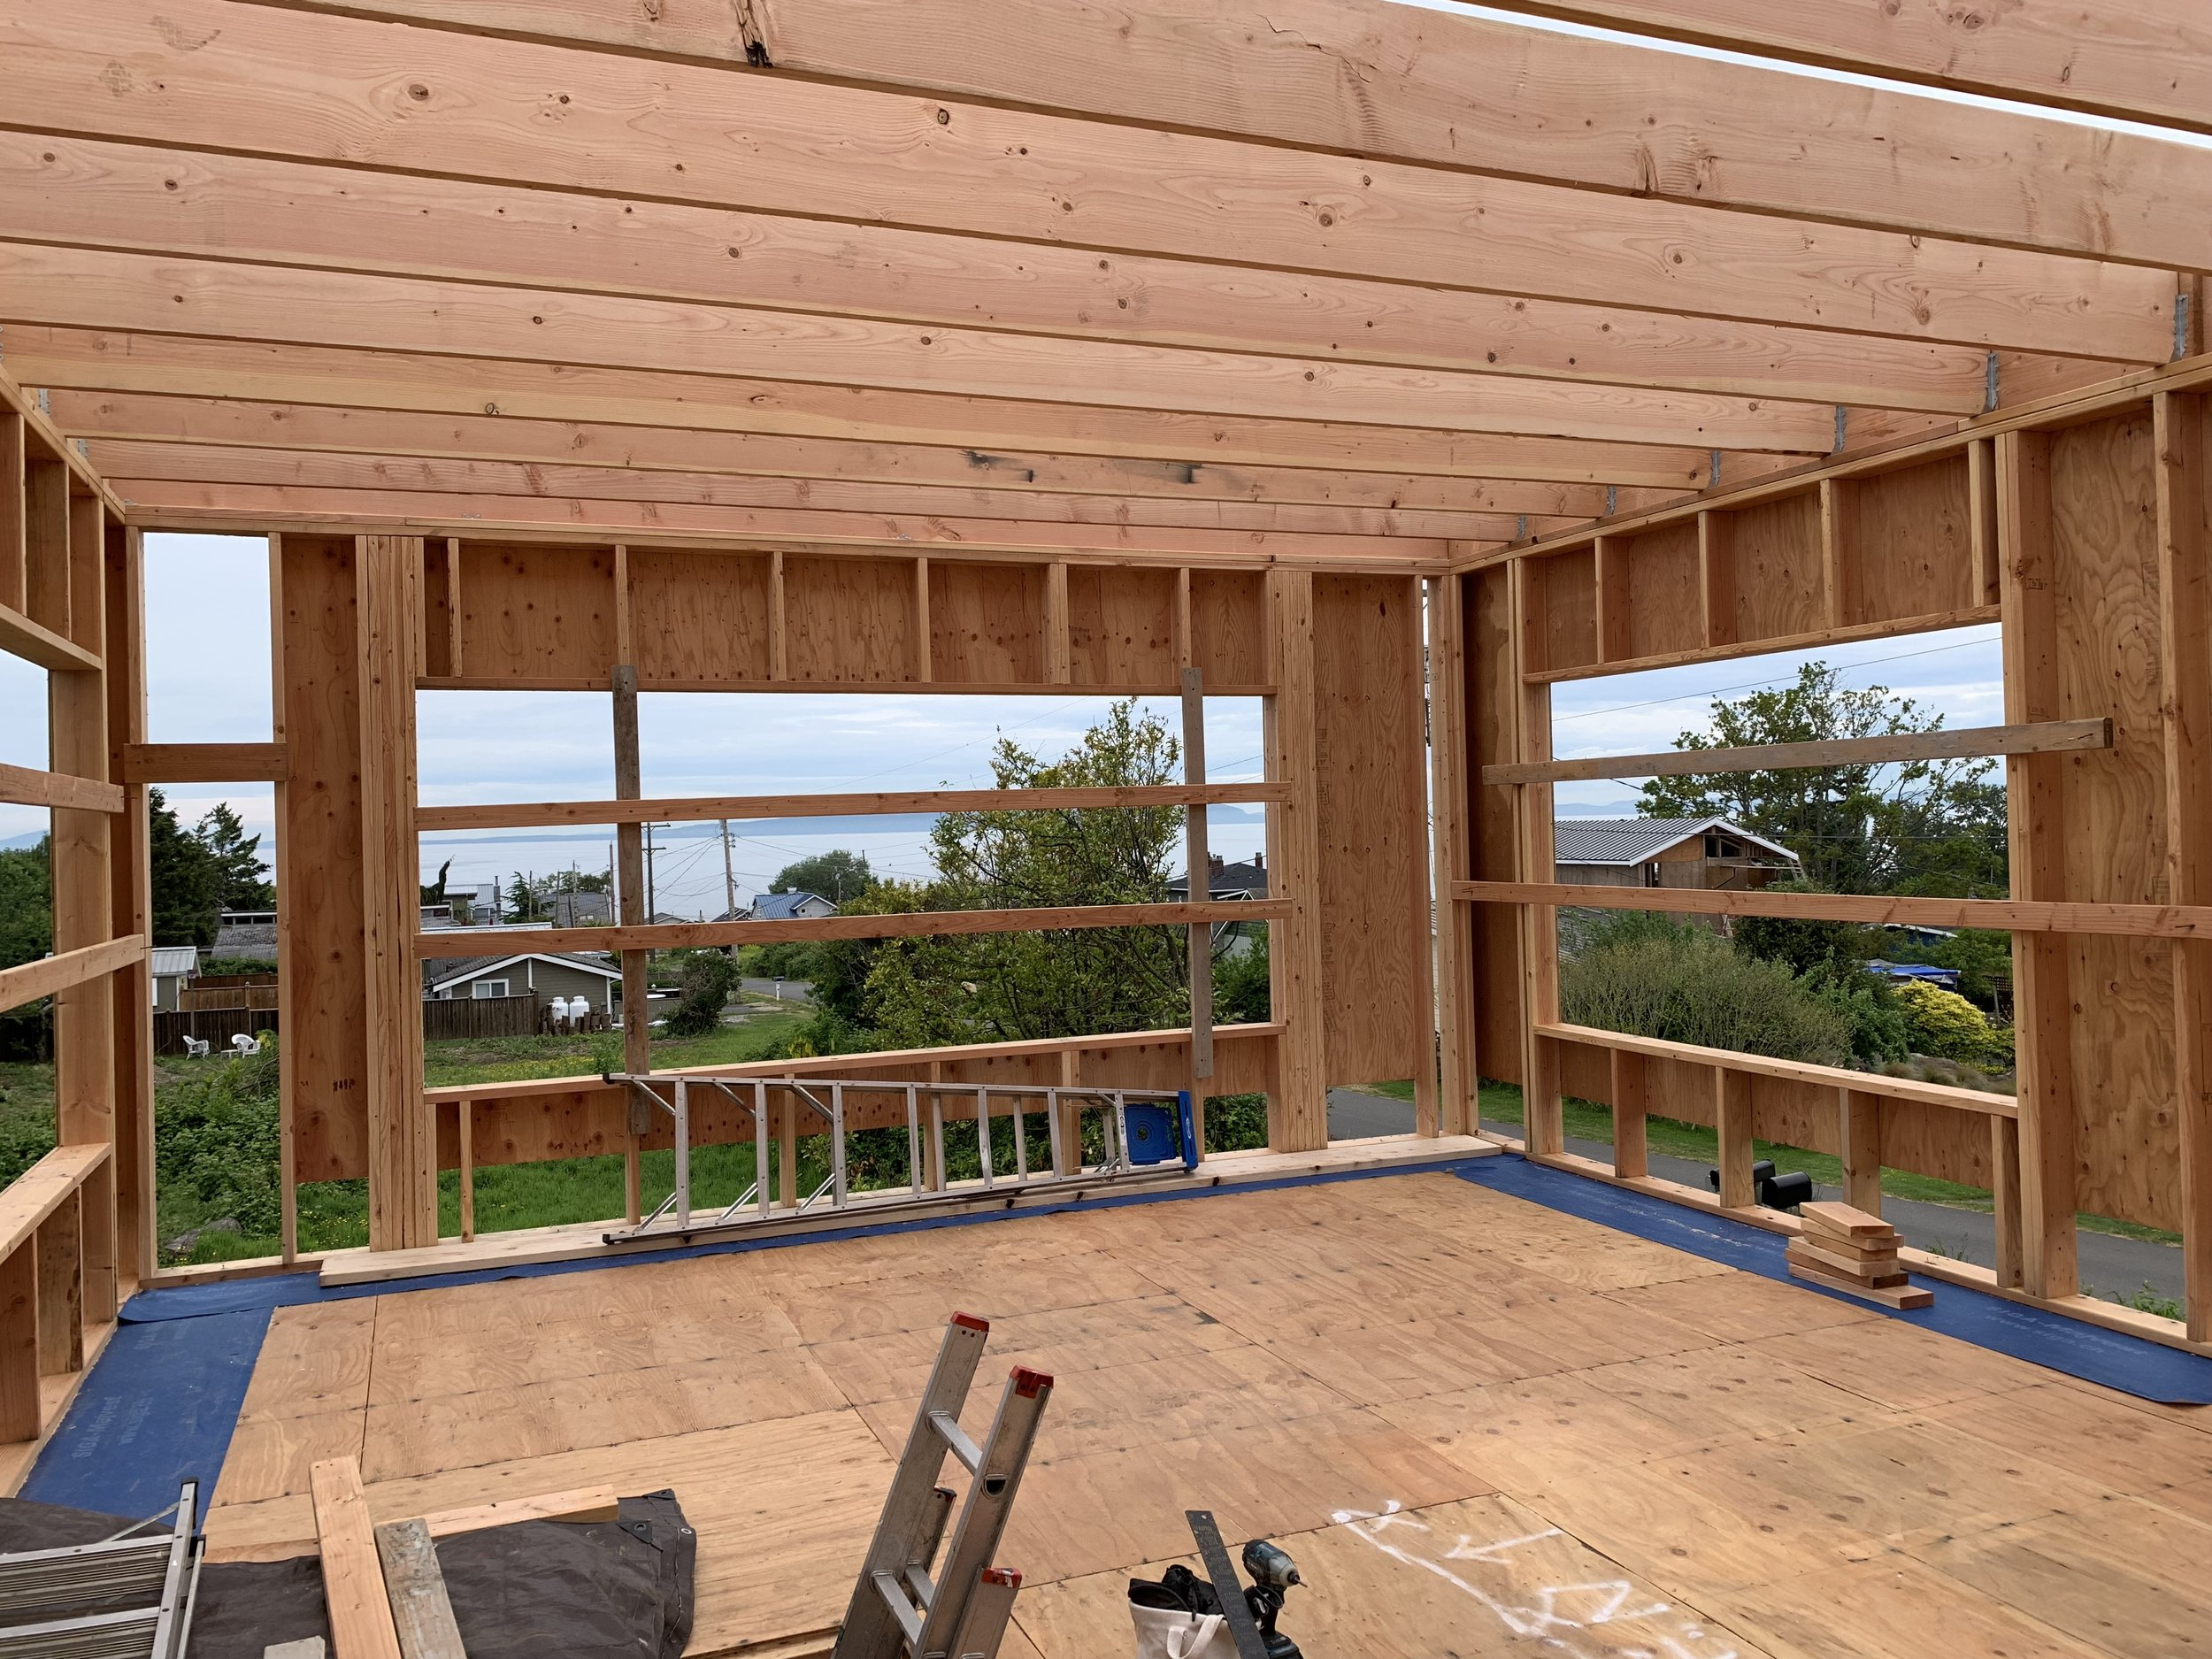 Flat roof framing